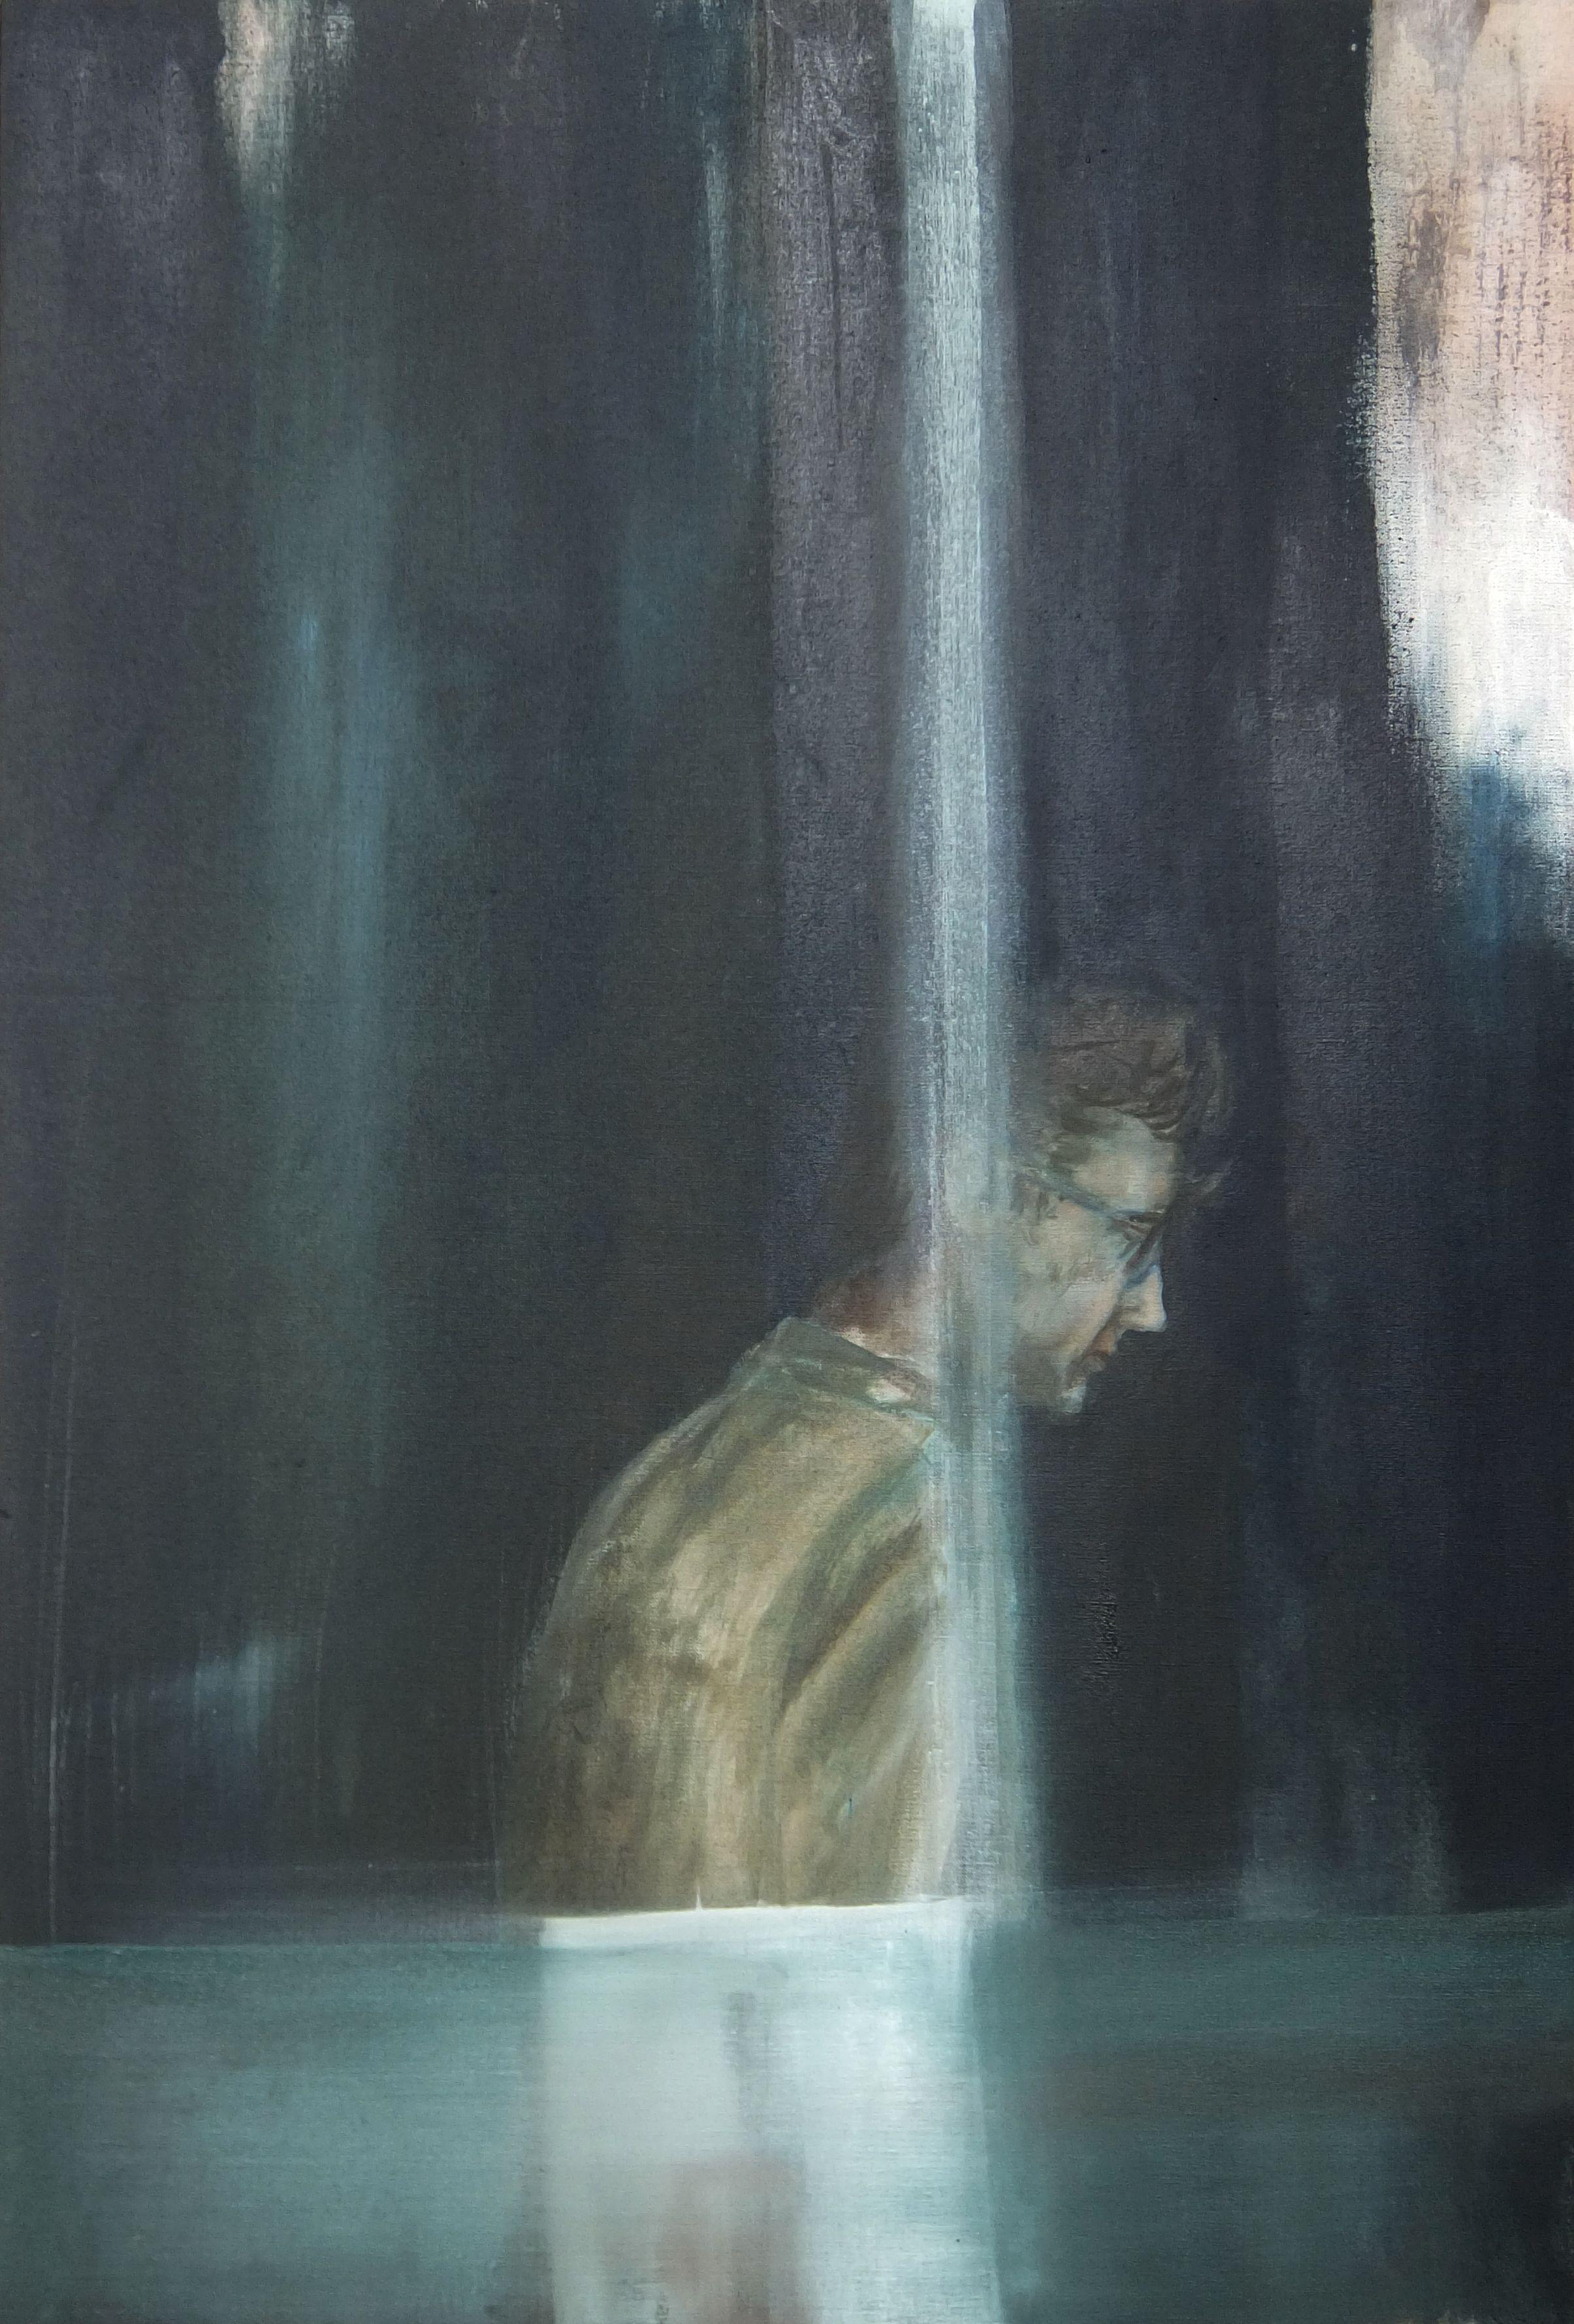 Berwick Hidden 60x 90 cm oil on canvas © Austen O'Hanlon